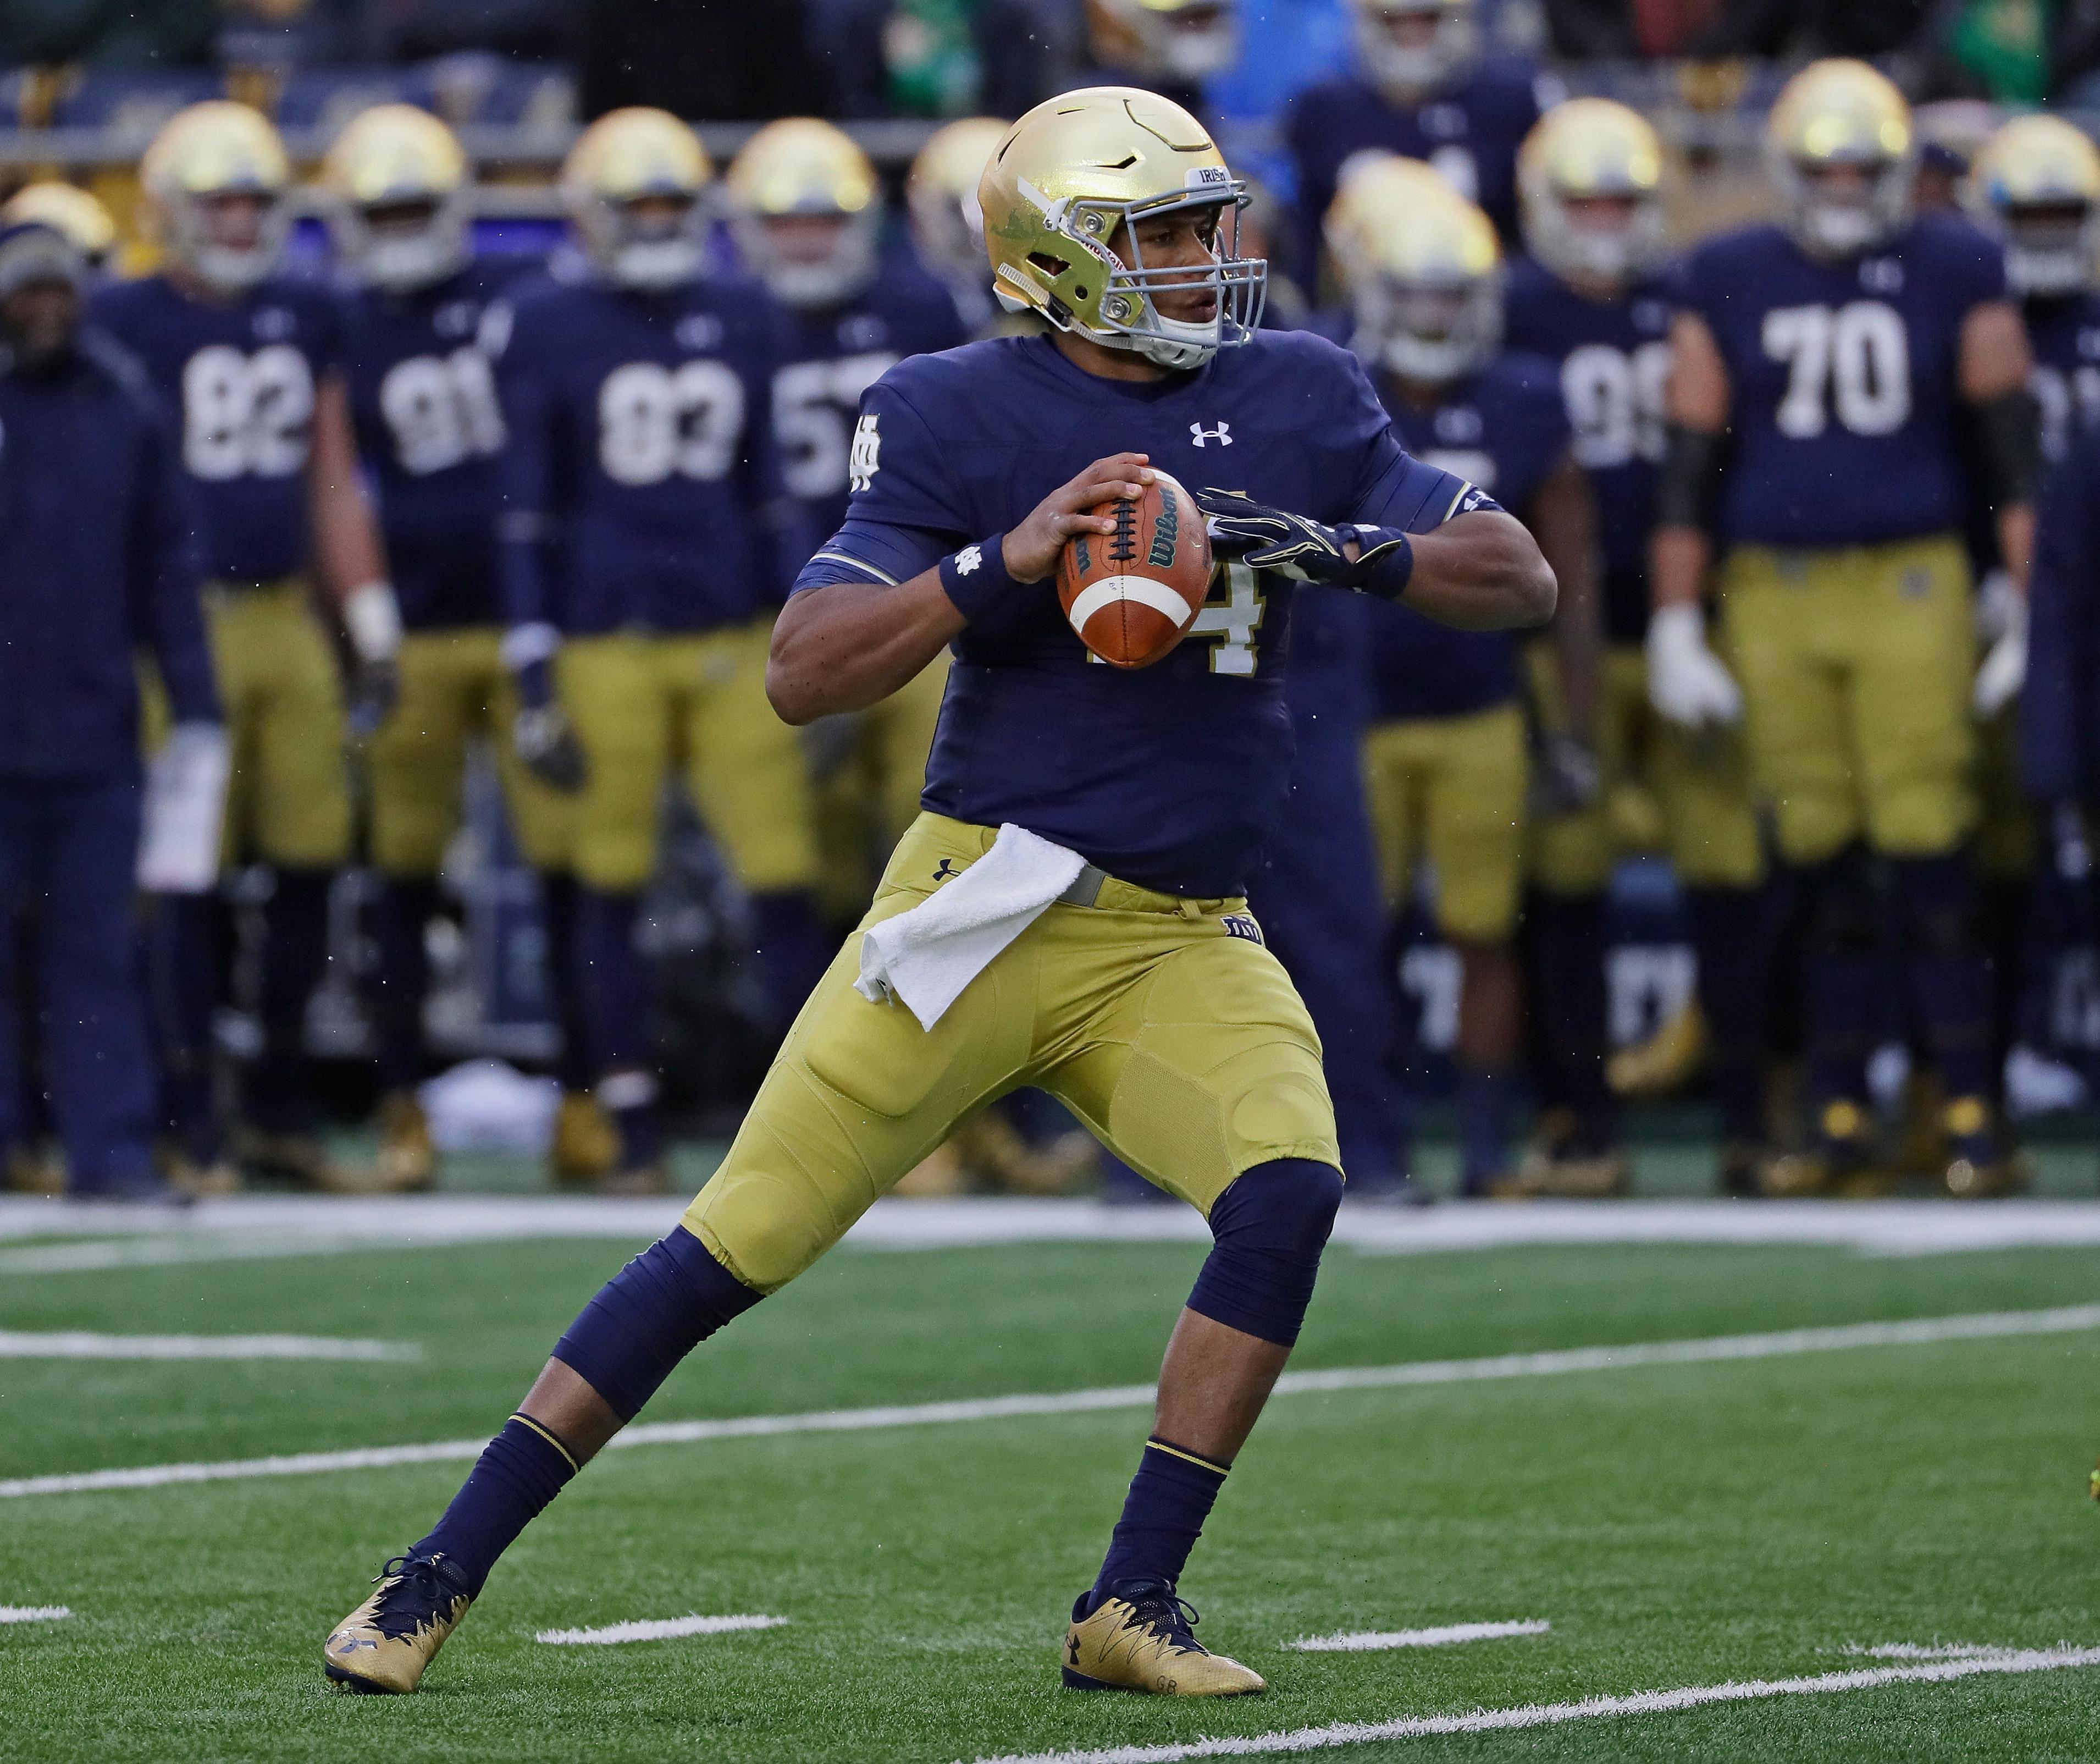 Kizer's draft slip sheds light on Notre Dame's difficult 2016